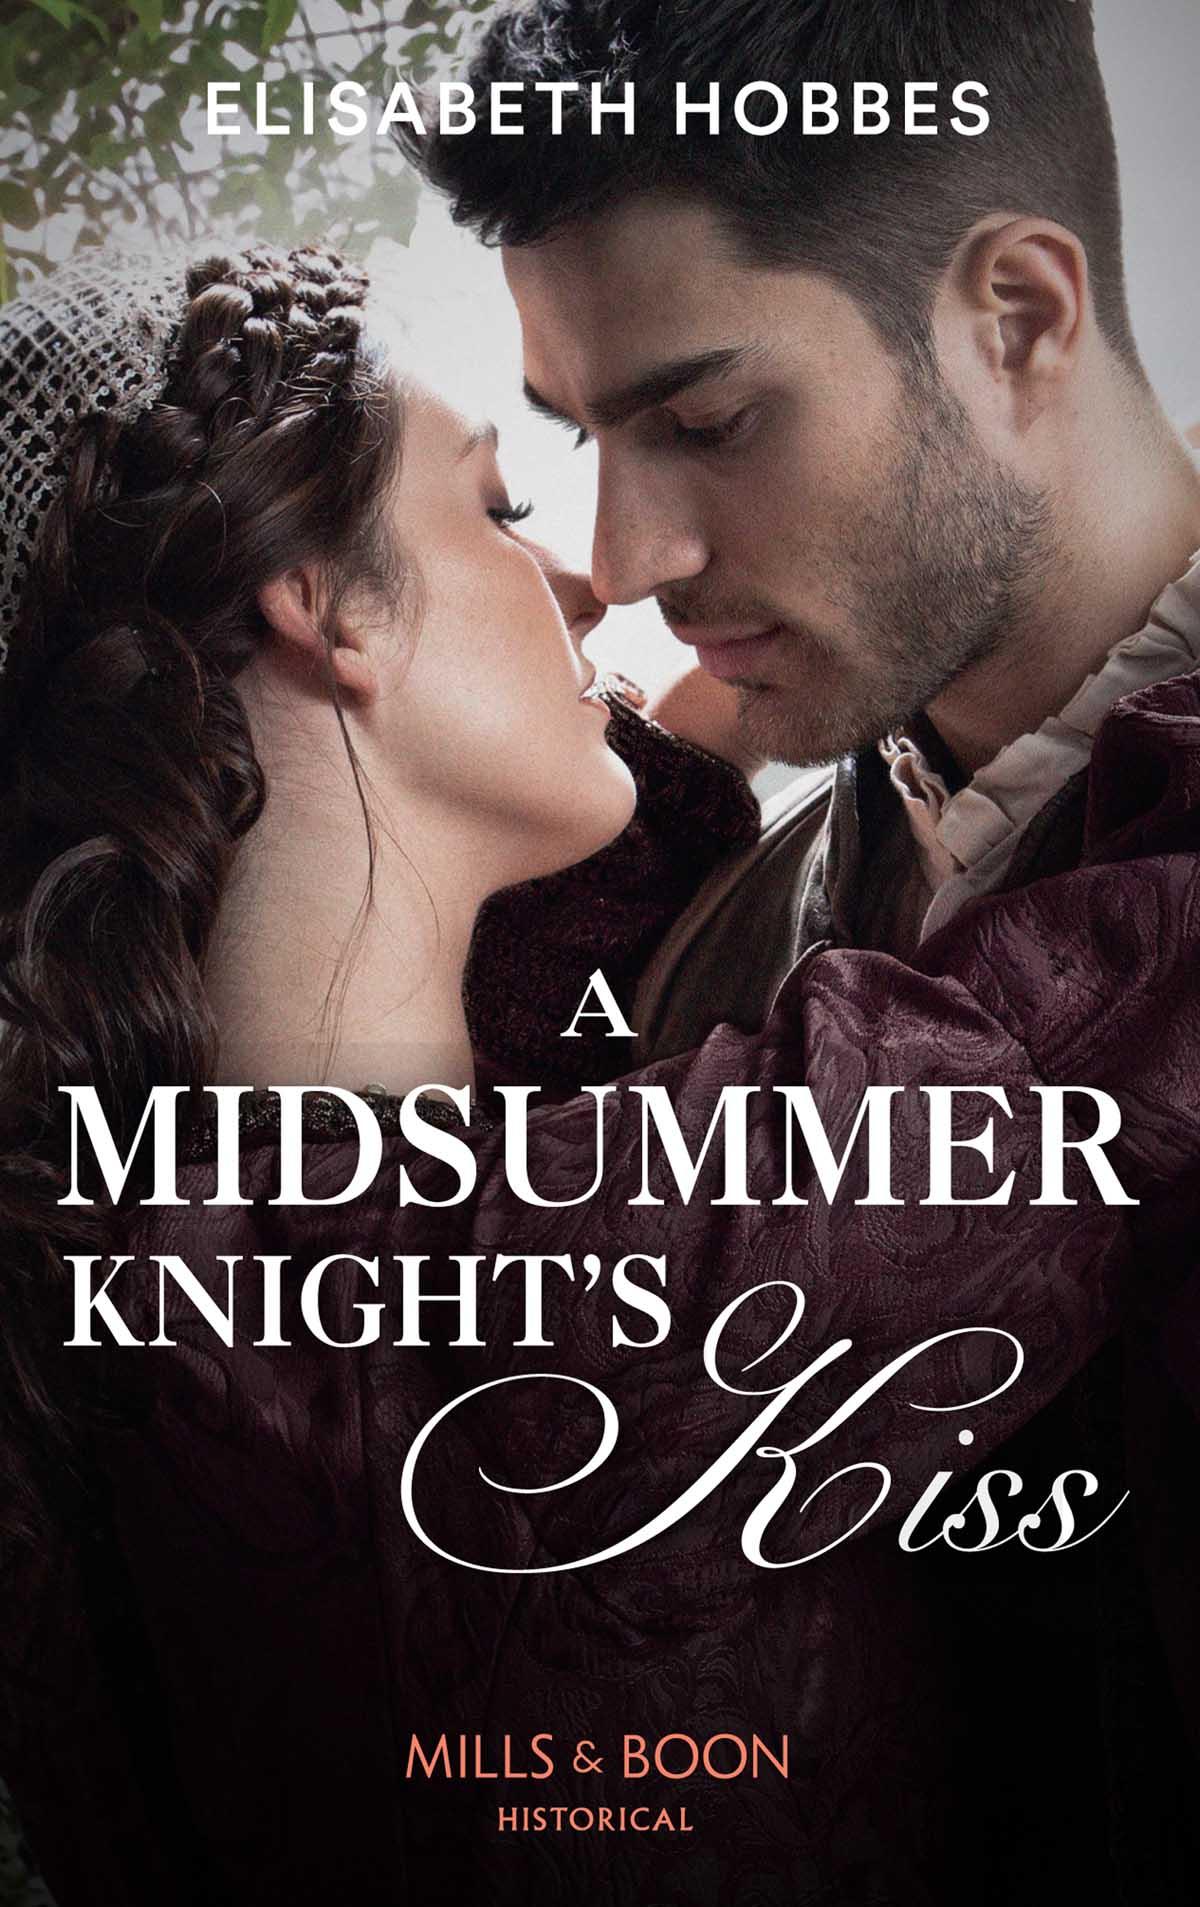 Elisabeth Hobbes A Midsummer Knight's Kiss archie meets kiss